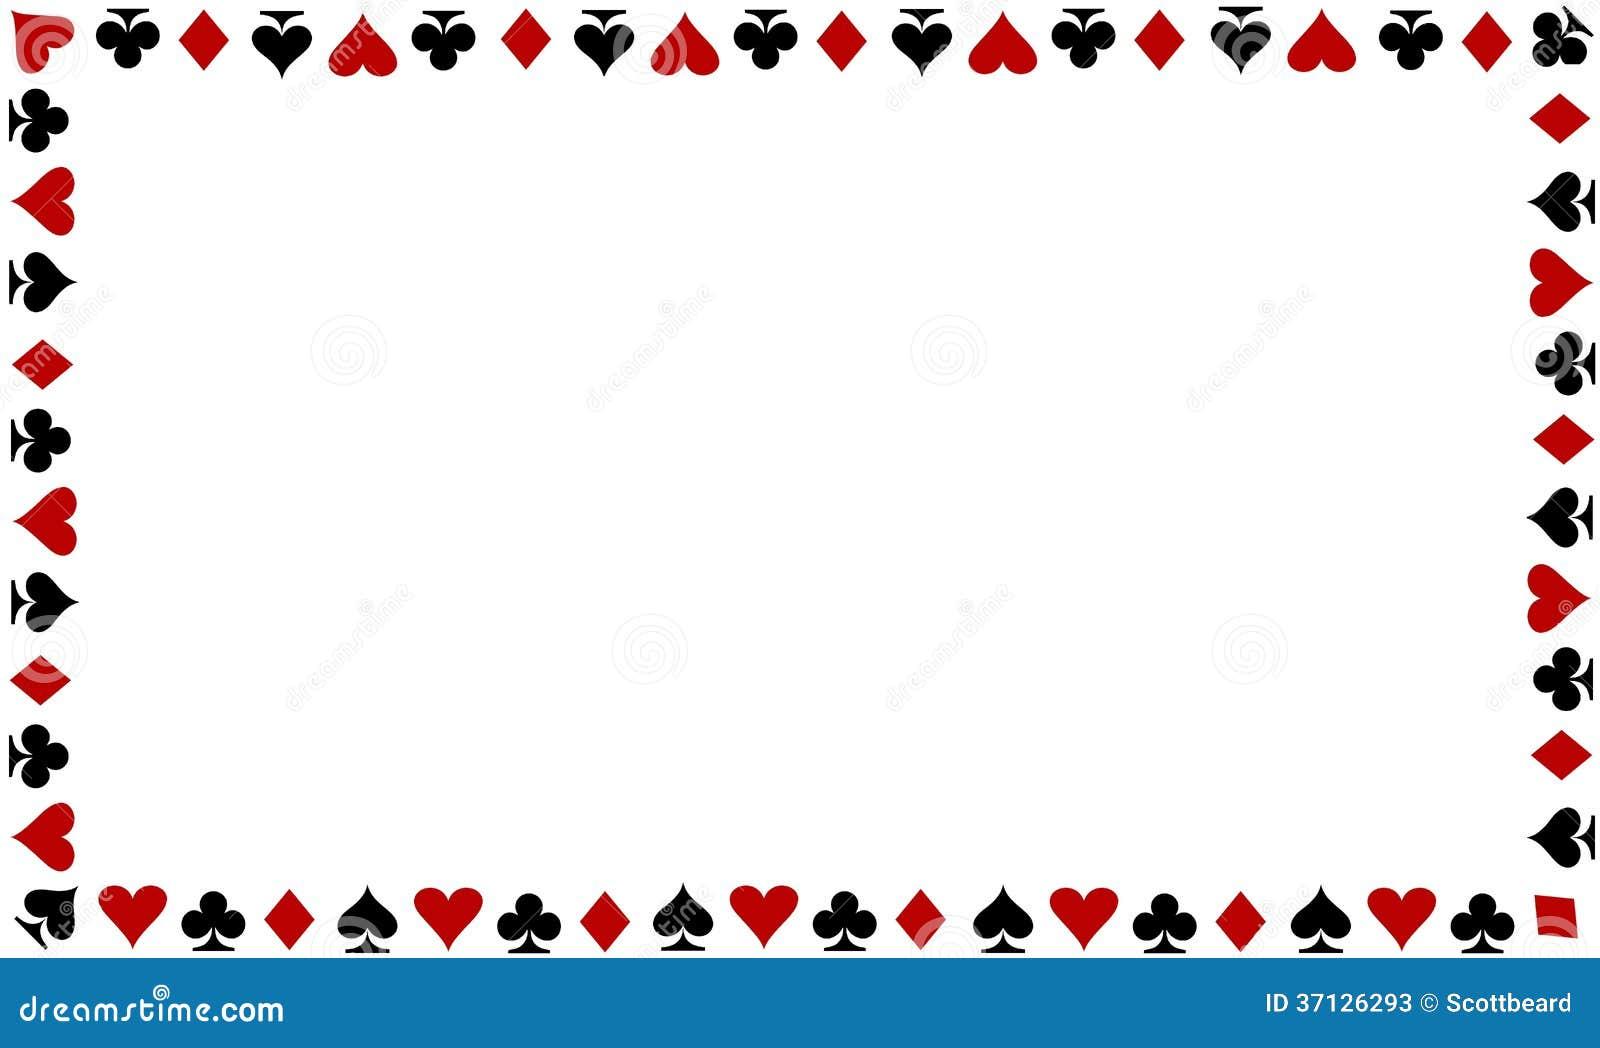 Playing Cards Border On White Background Stock Photos - Image ...